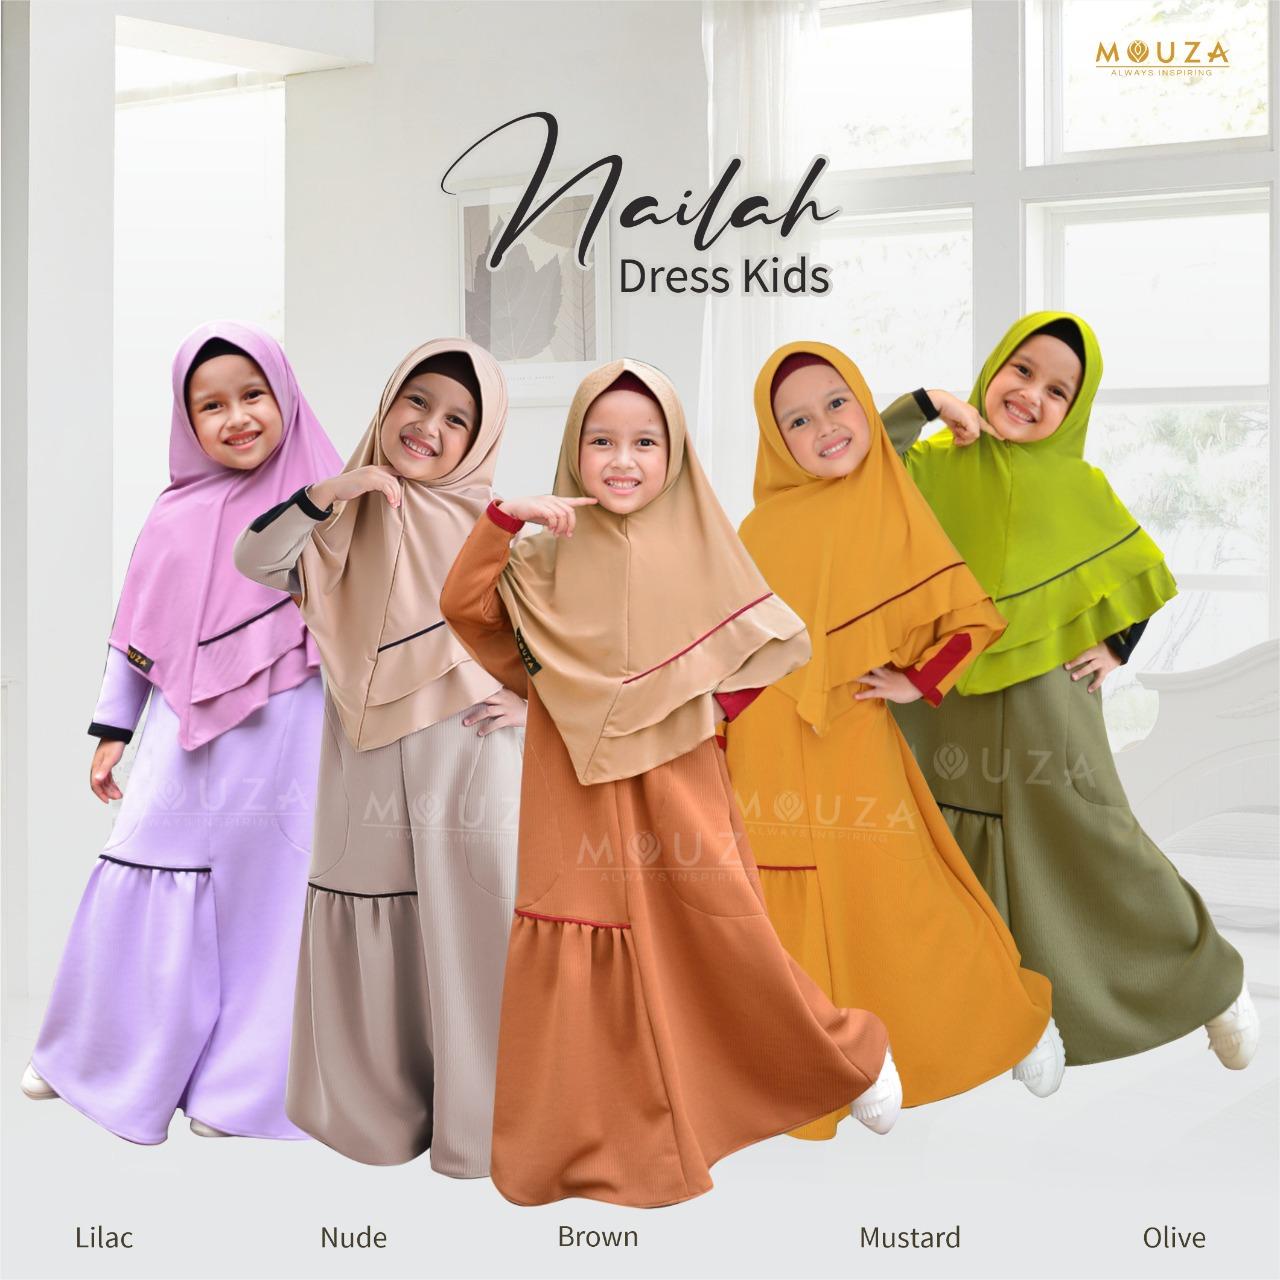 Nailah Dress Kids